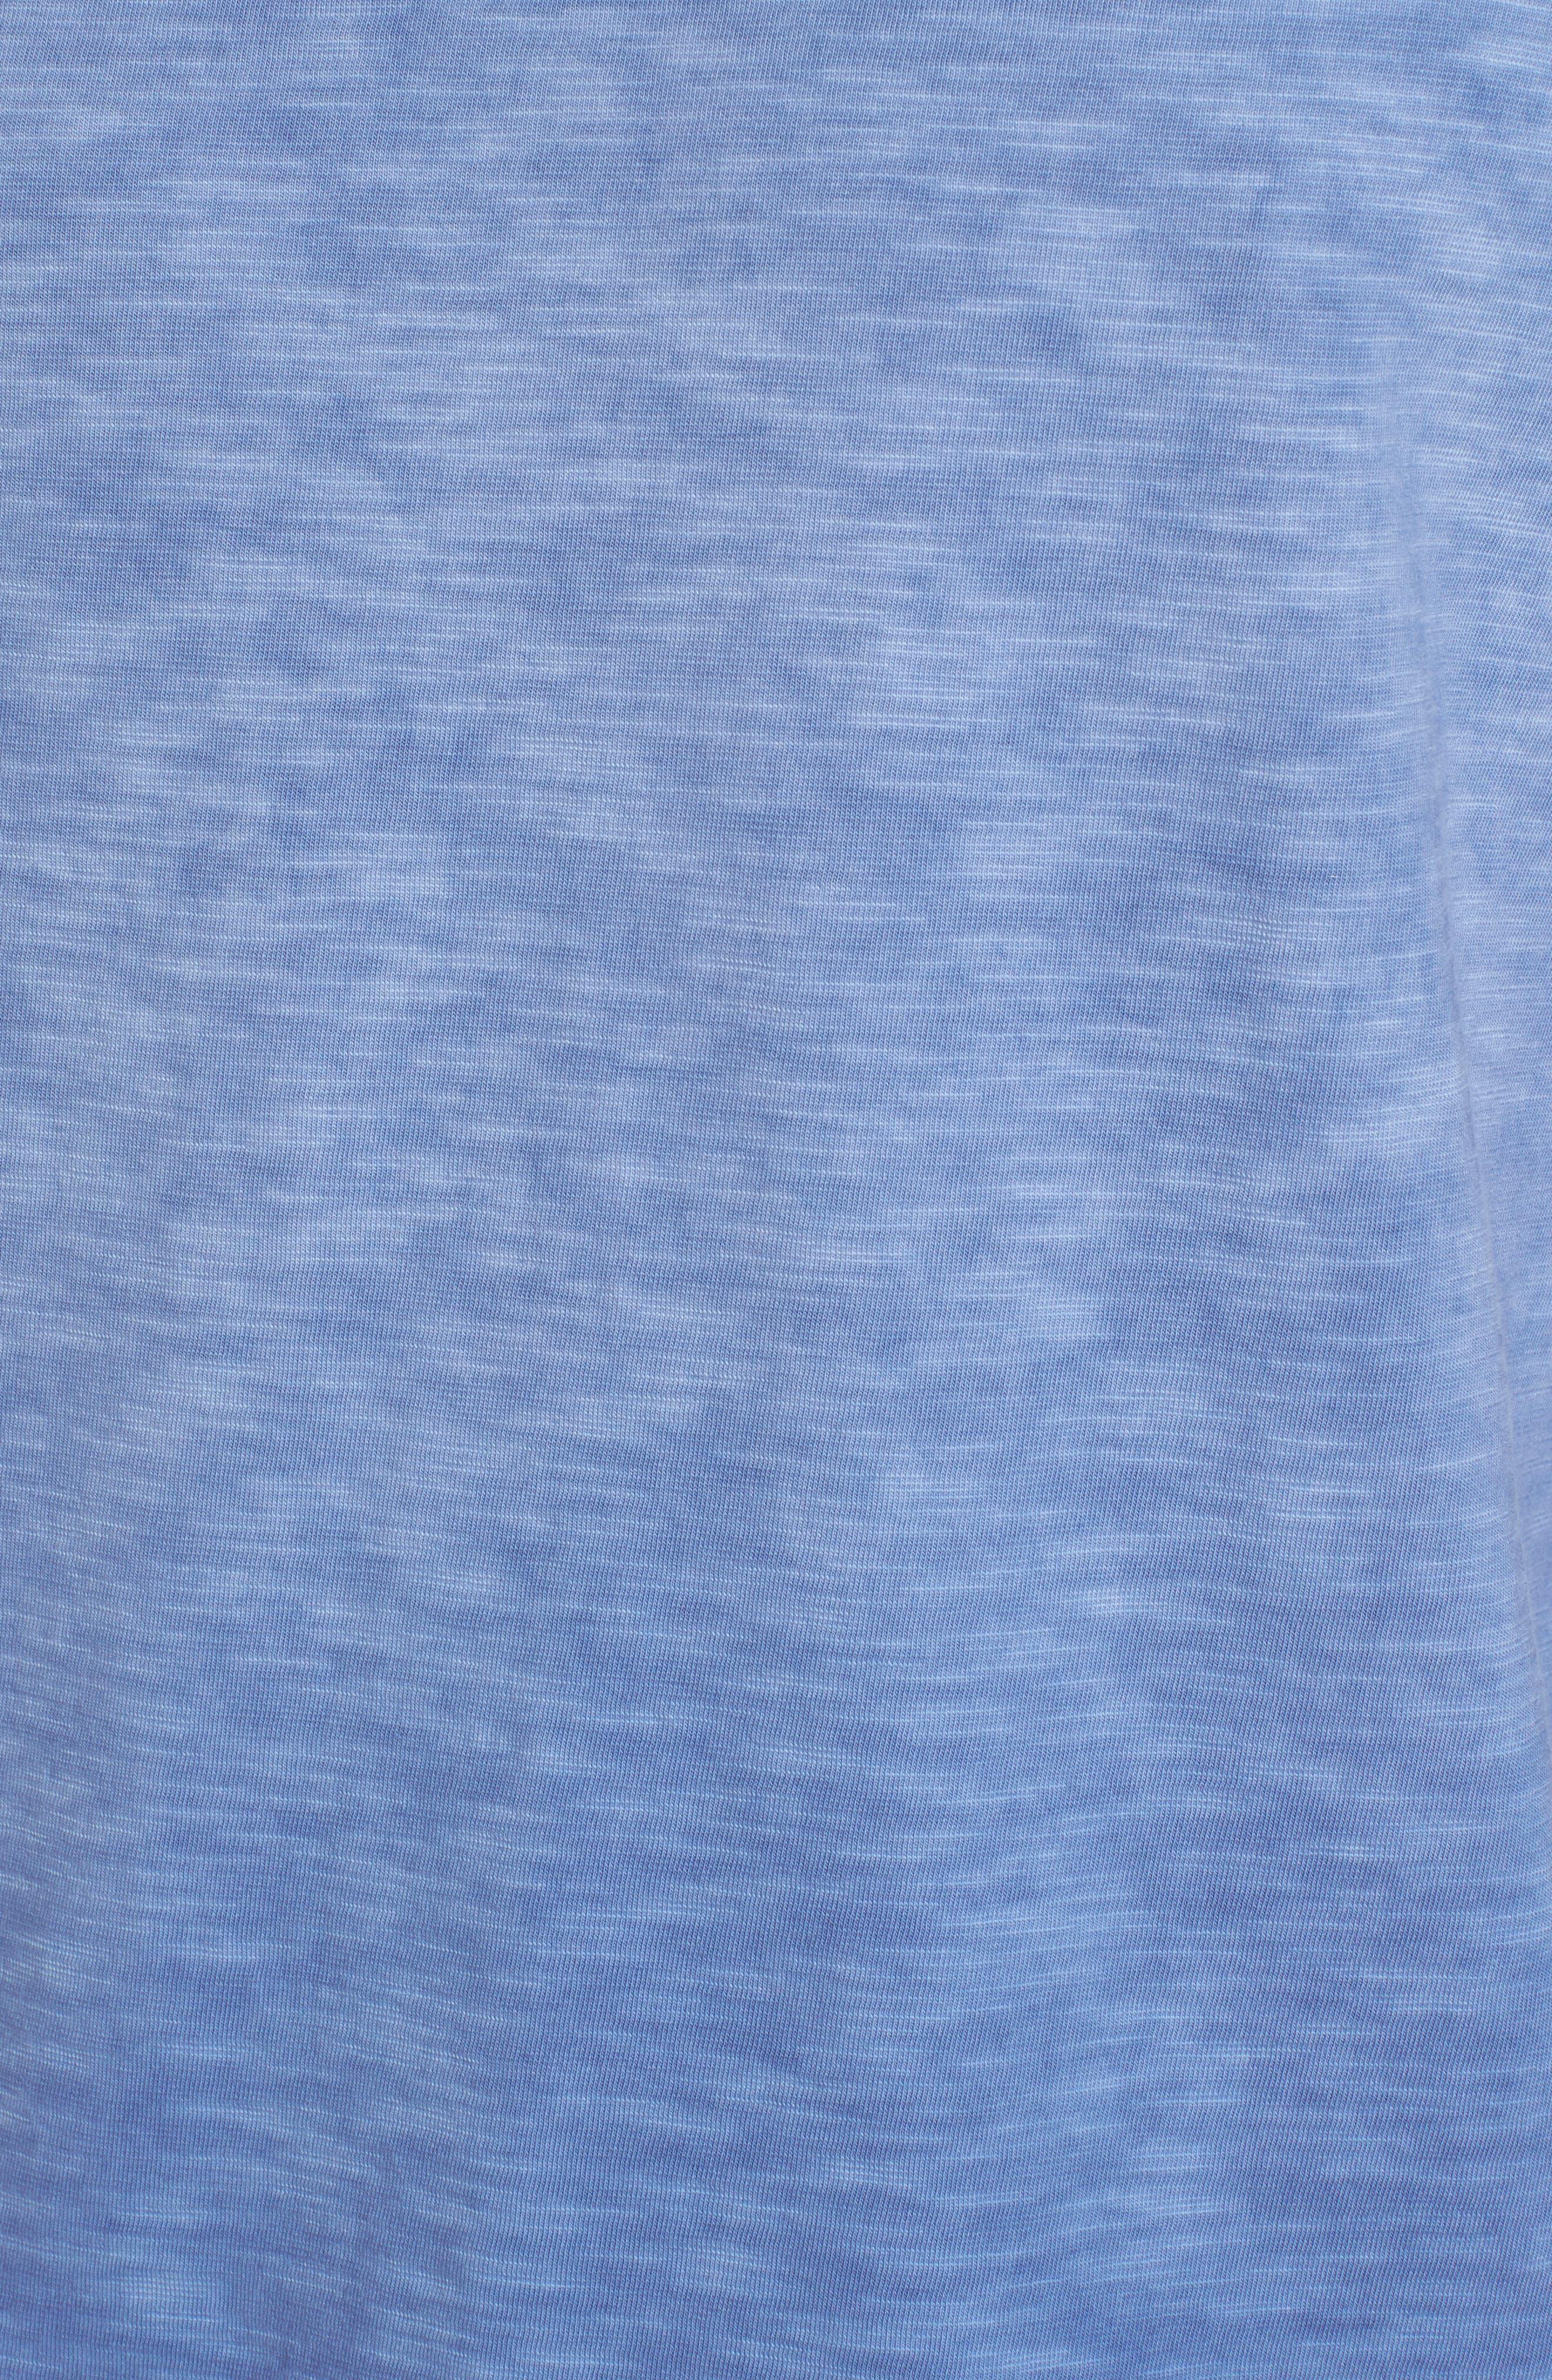 Suncoast Shores V-Neck T-Shirt,                             Alternate thumbnail 5, color,                             Dockside Blue